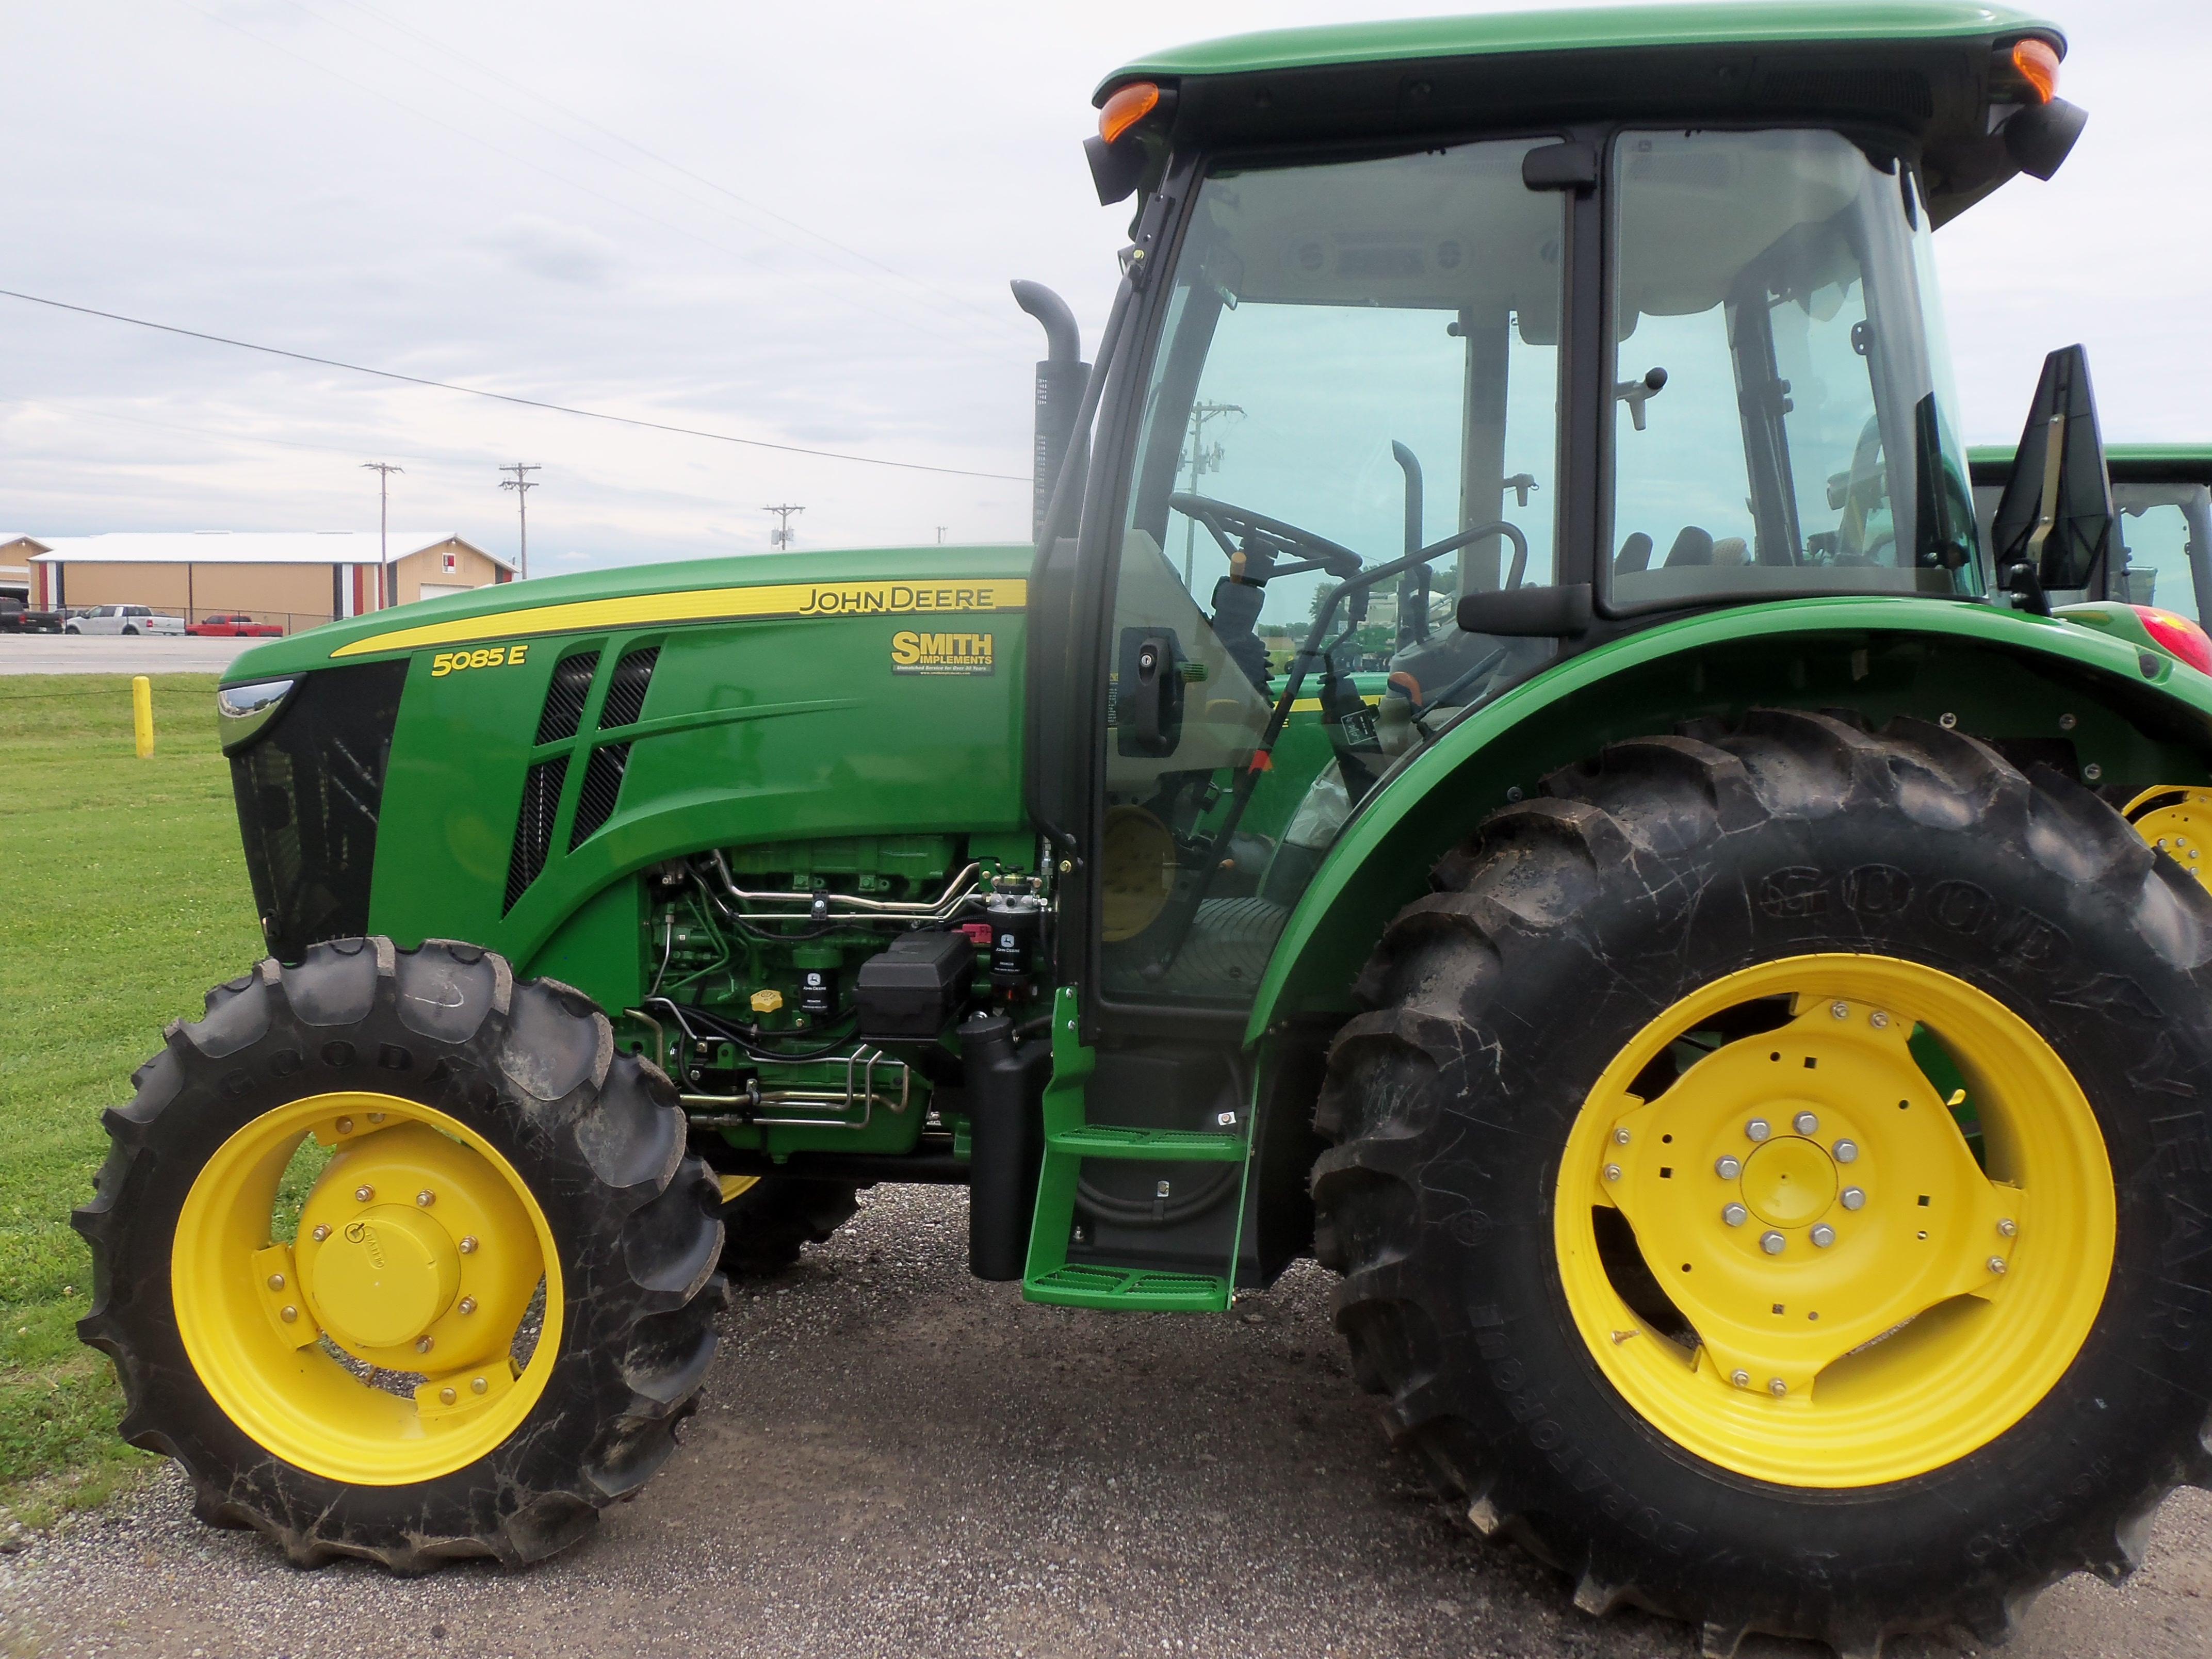 John Deere 5085E cab tractor.Same hp as the 70-hp 2630 ...